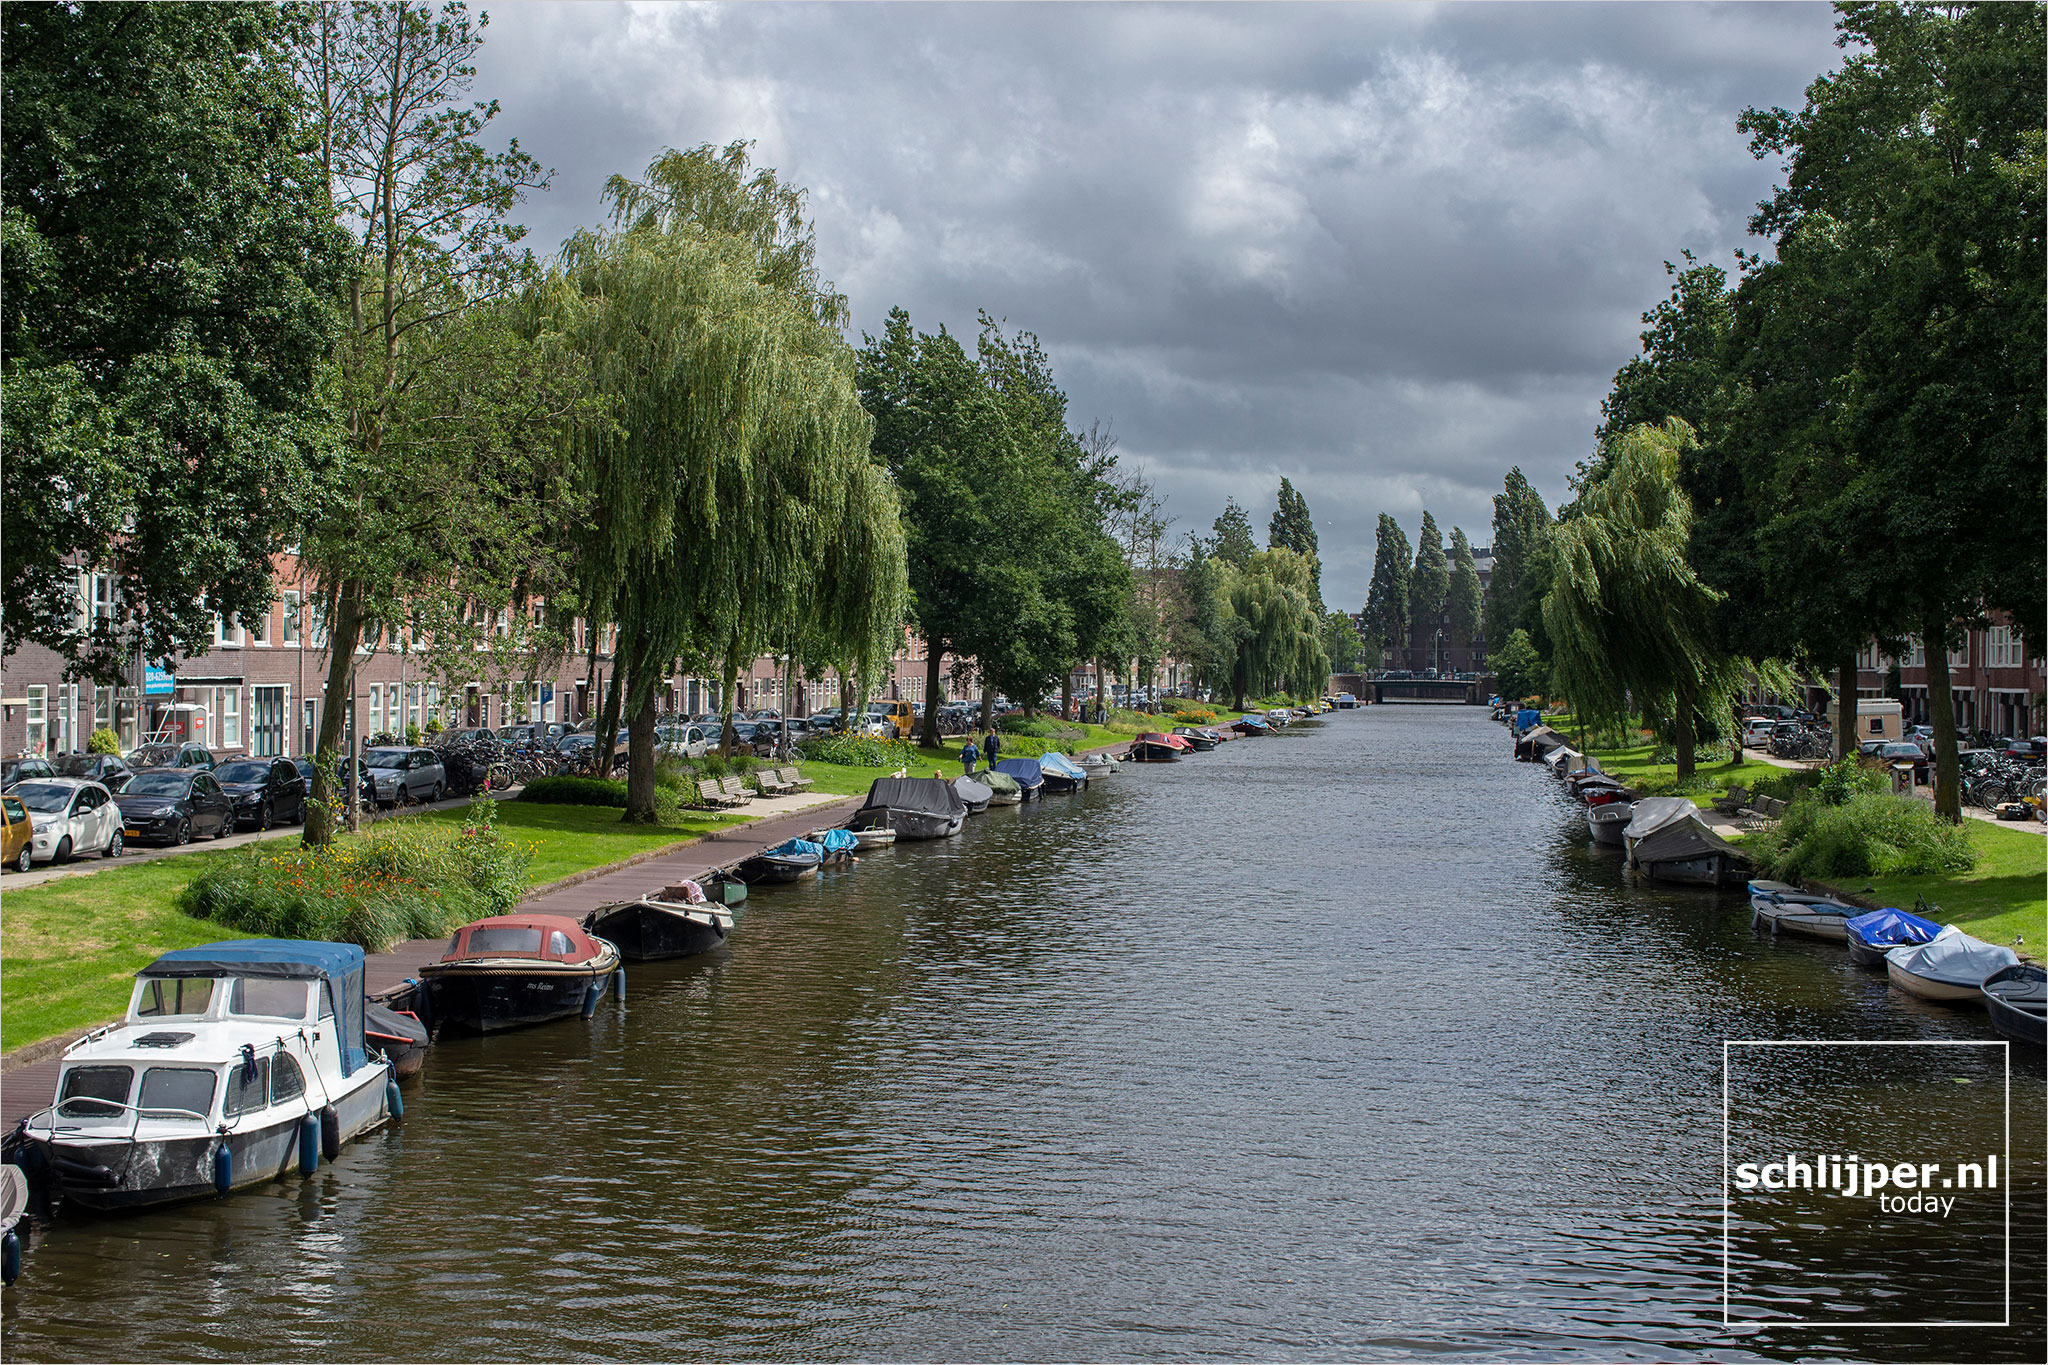 Nederland, Amsterdam, 5 juli 2020